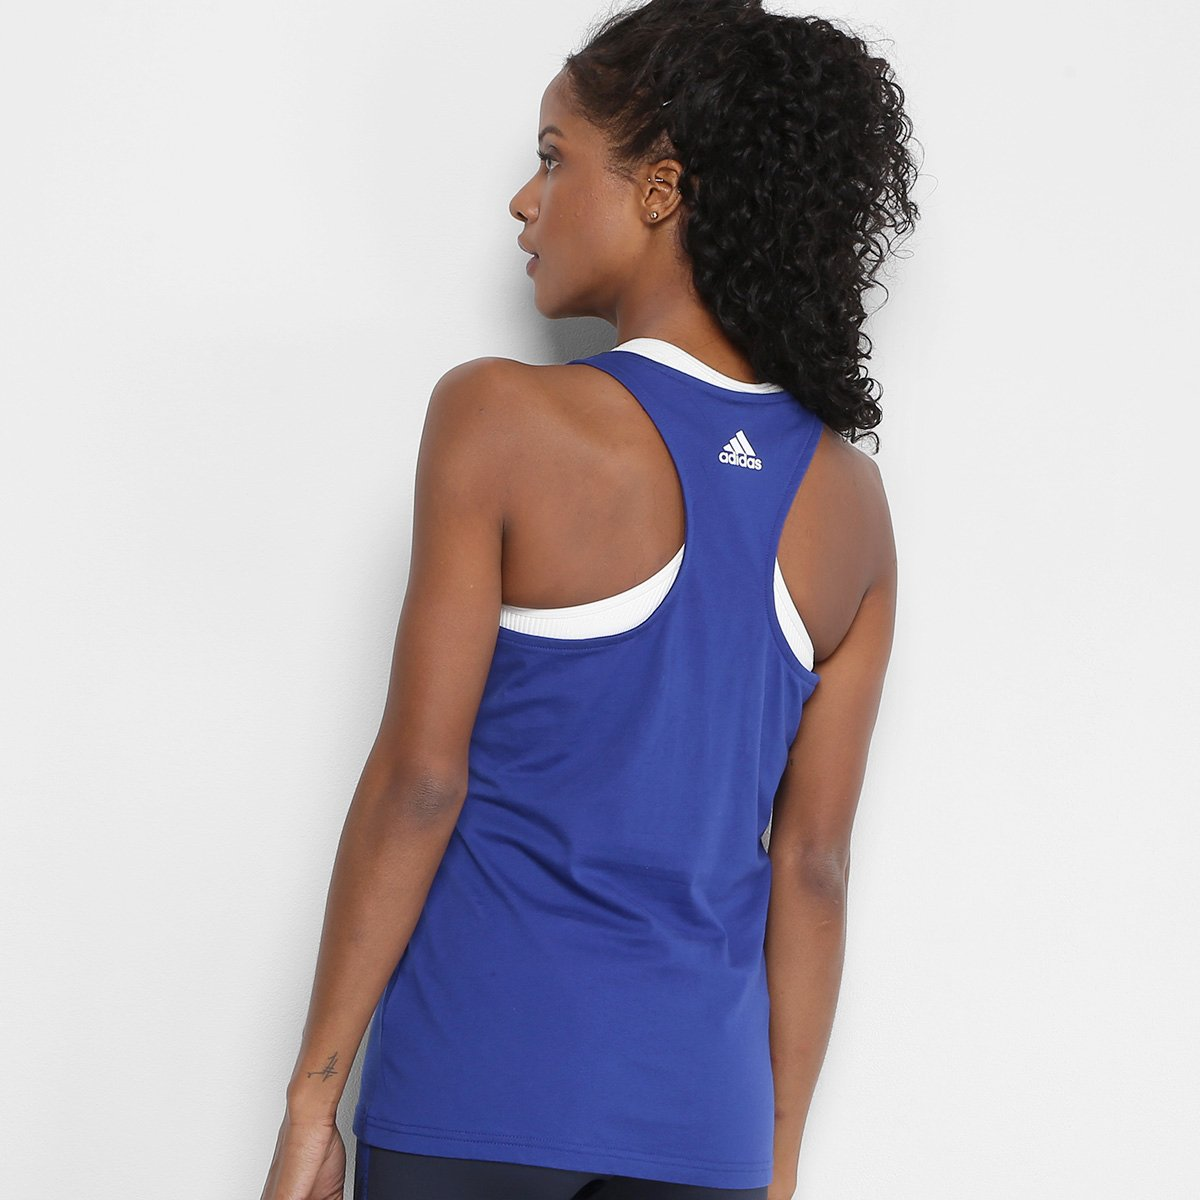 Regata Adidas Essentials Li Sli Tank Feminina - Pink e Branco ... c5ce4353c61b0